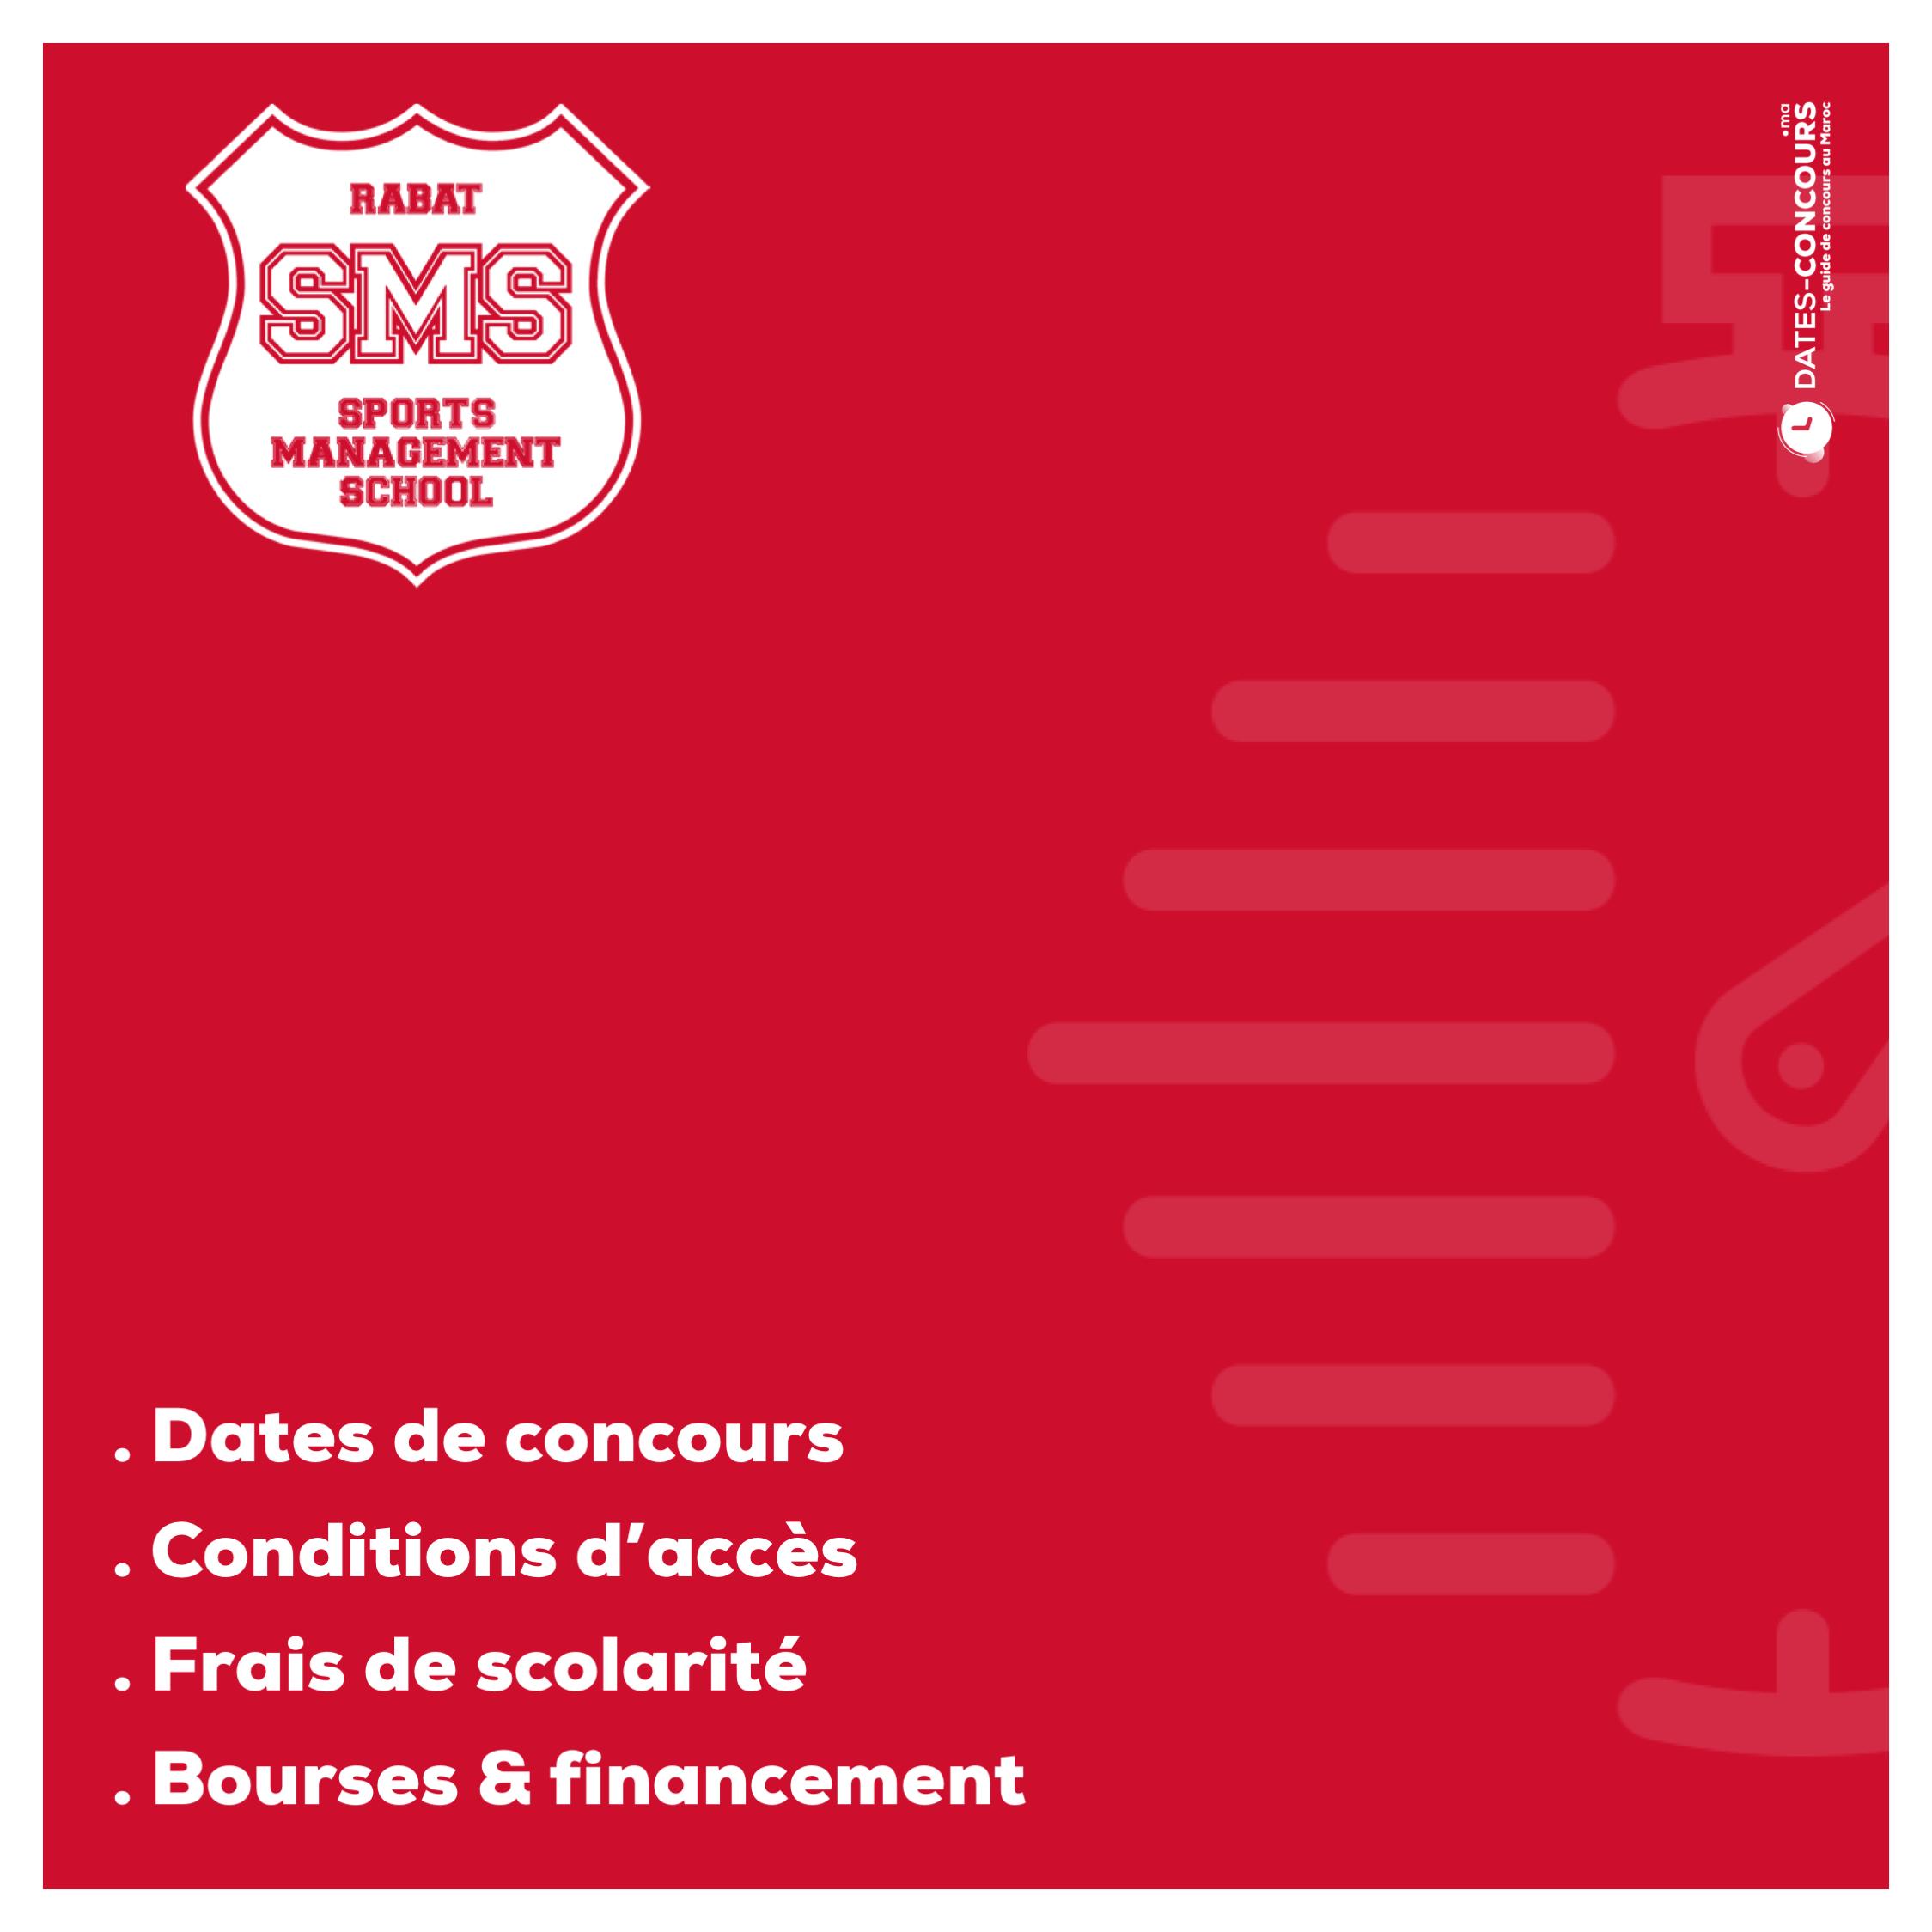 SMS Sport Management School